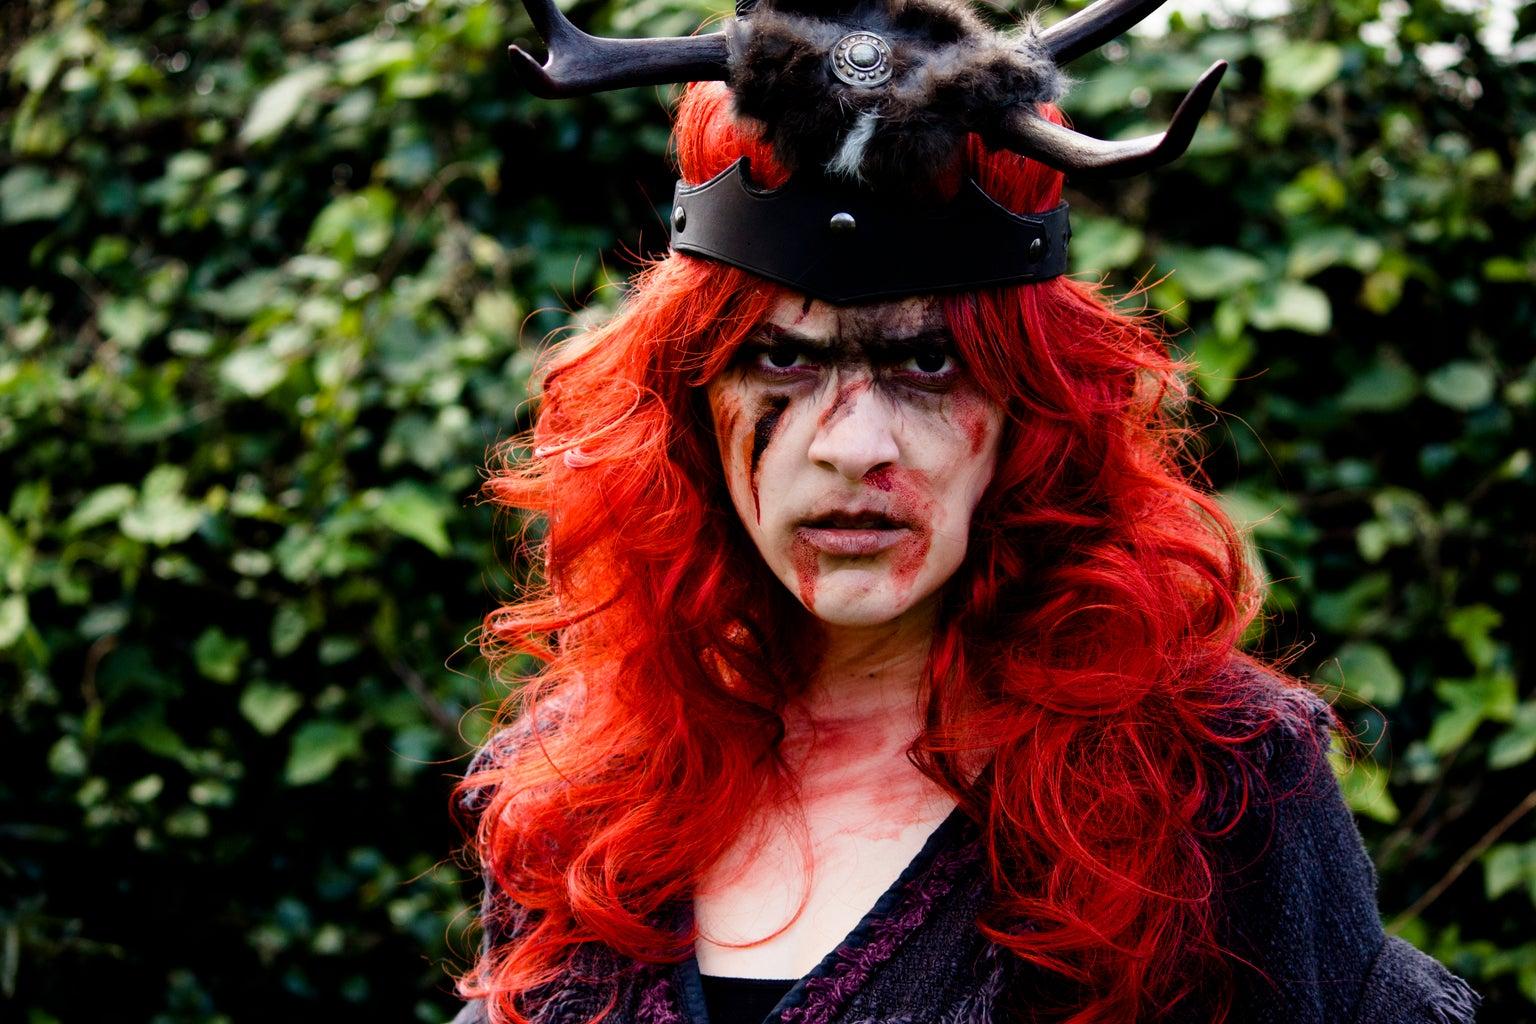 Seven Deadly Sins: Wrath Makeup Tutorial